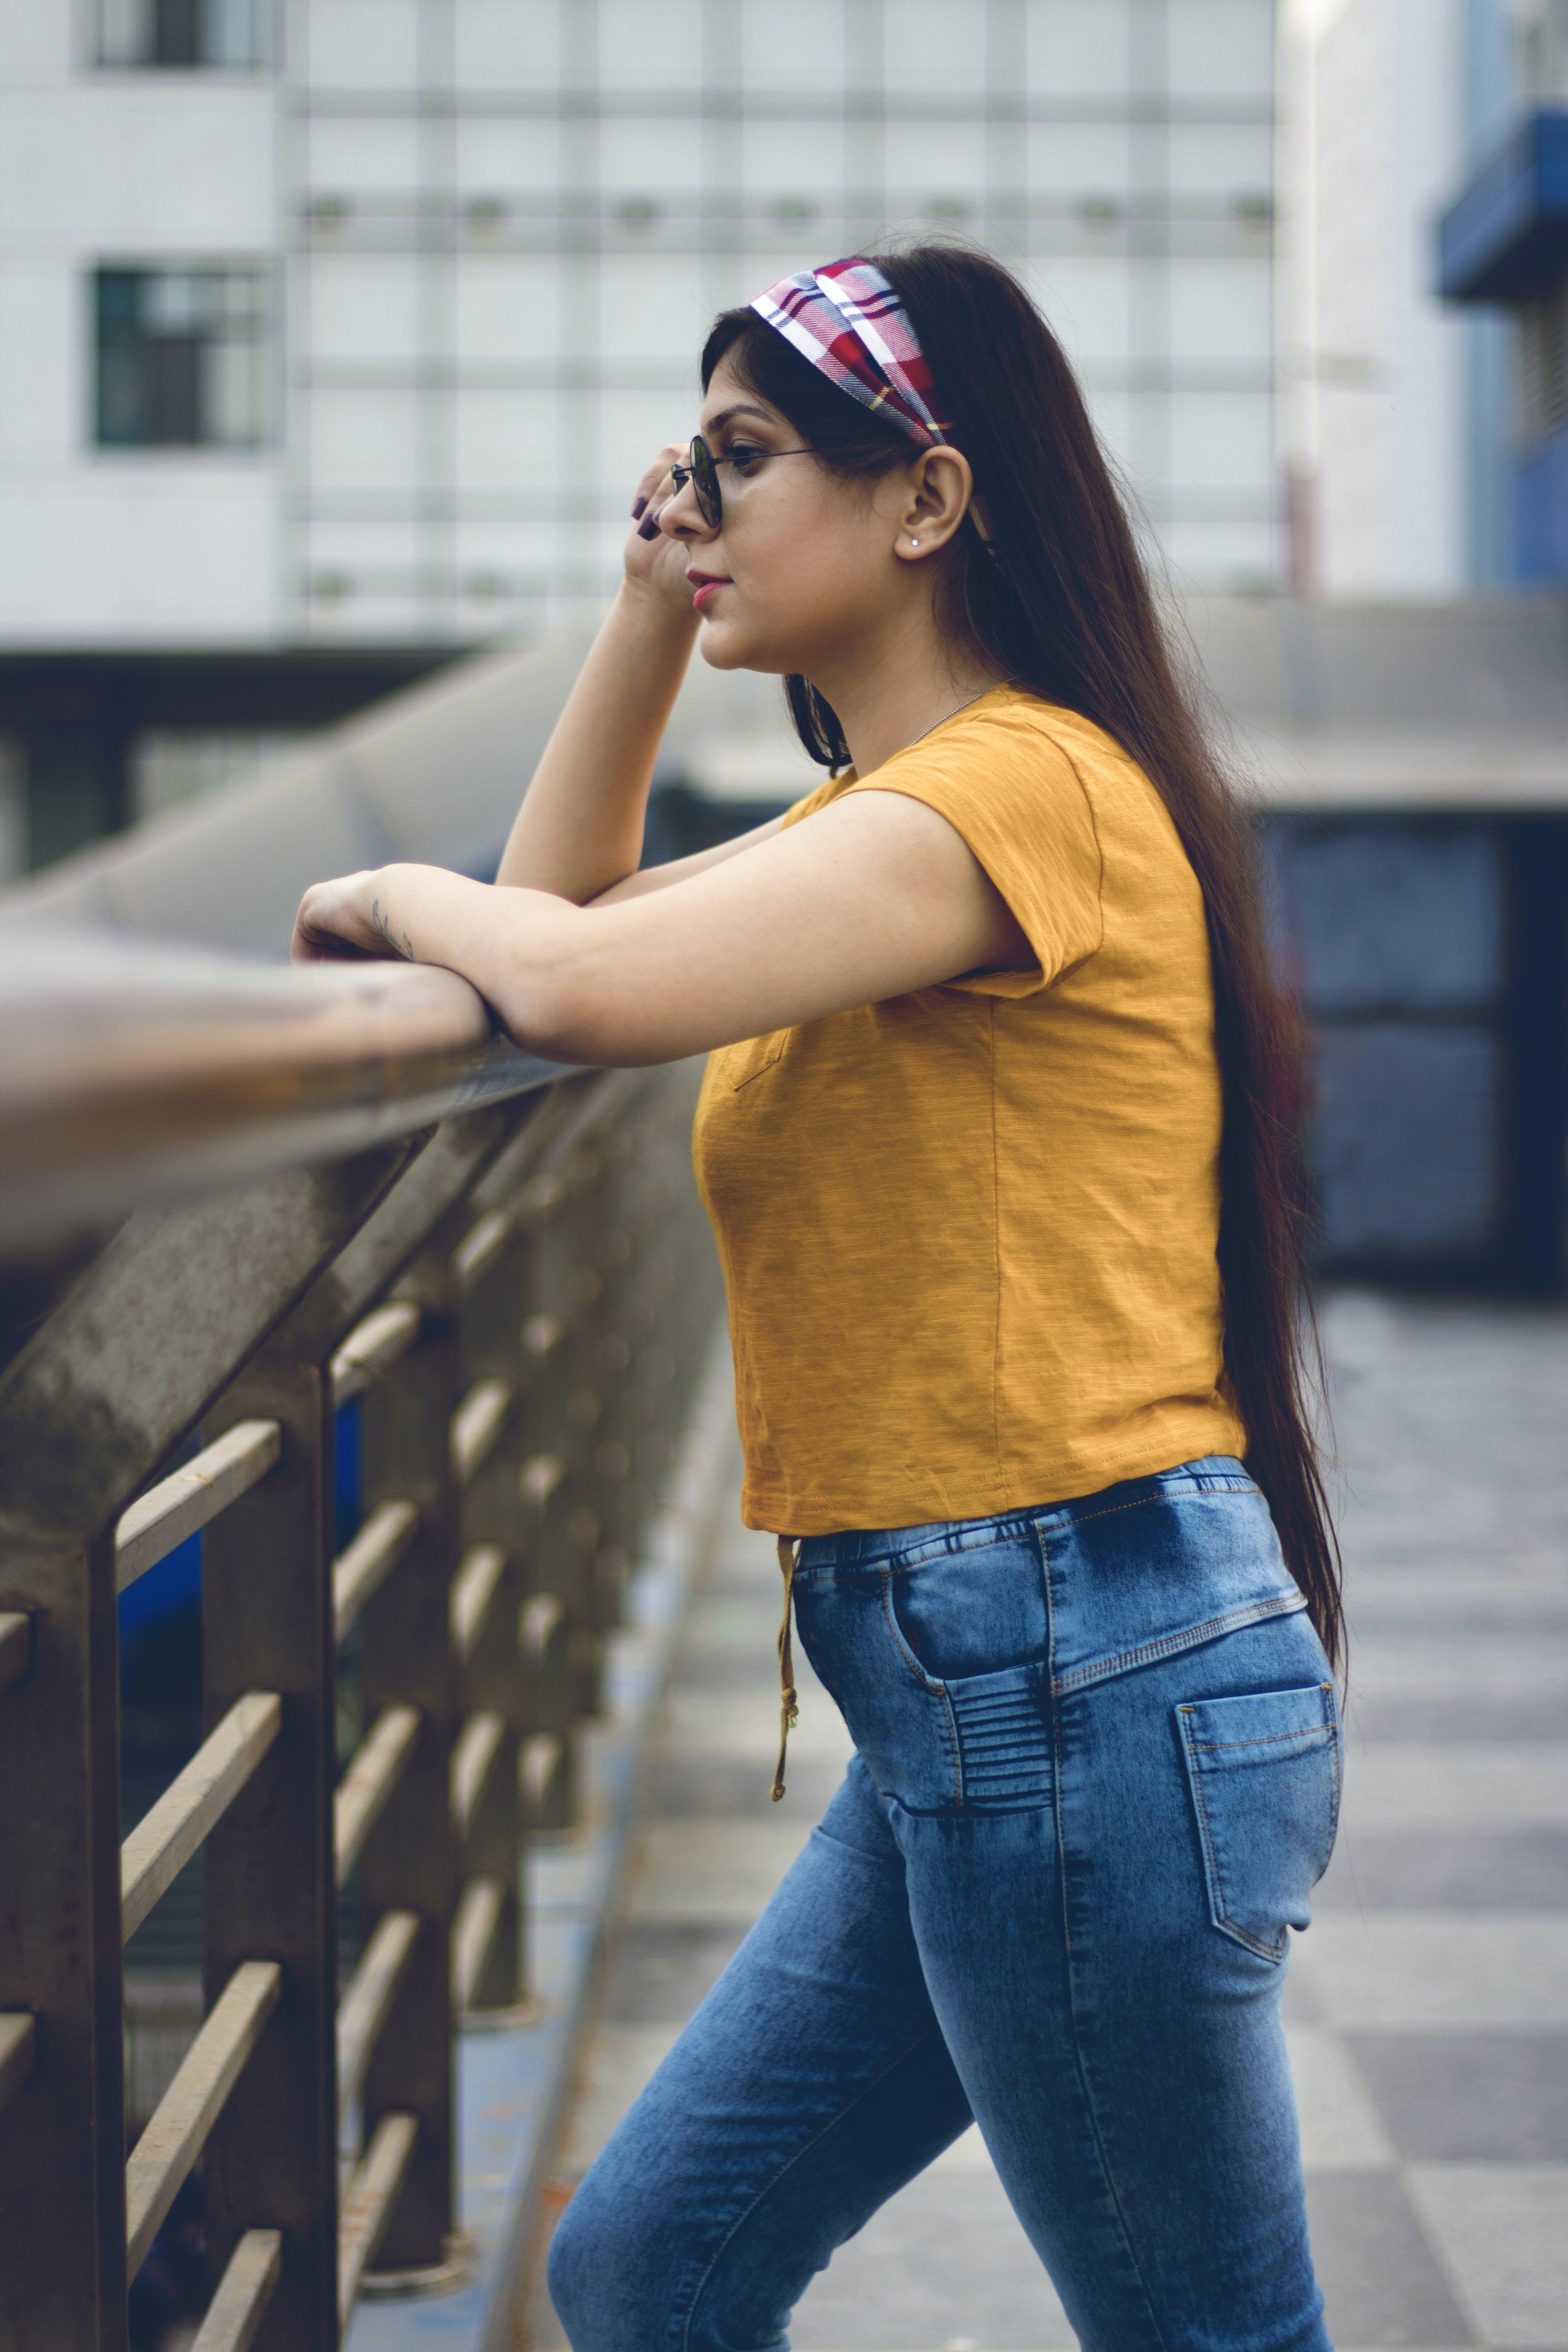 Woman Wearing Sunglasses Near High-rise Buildings